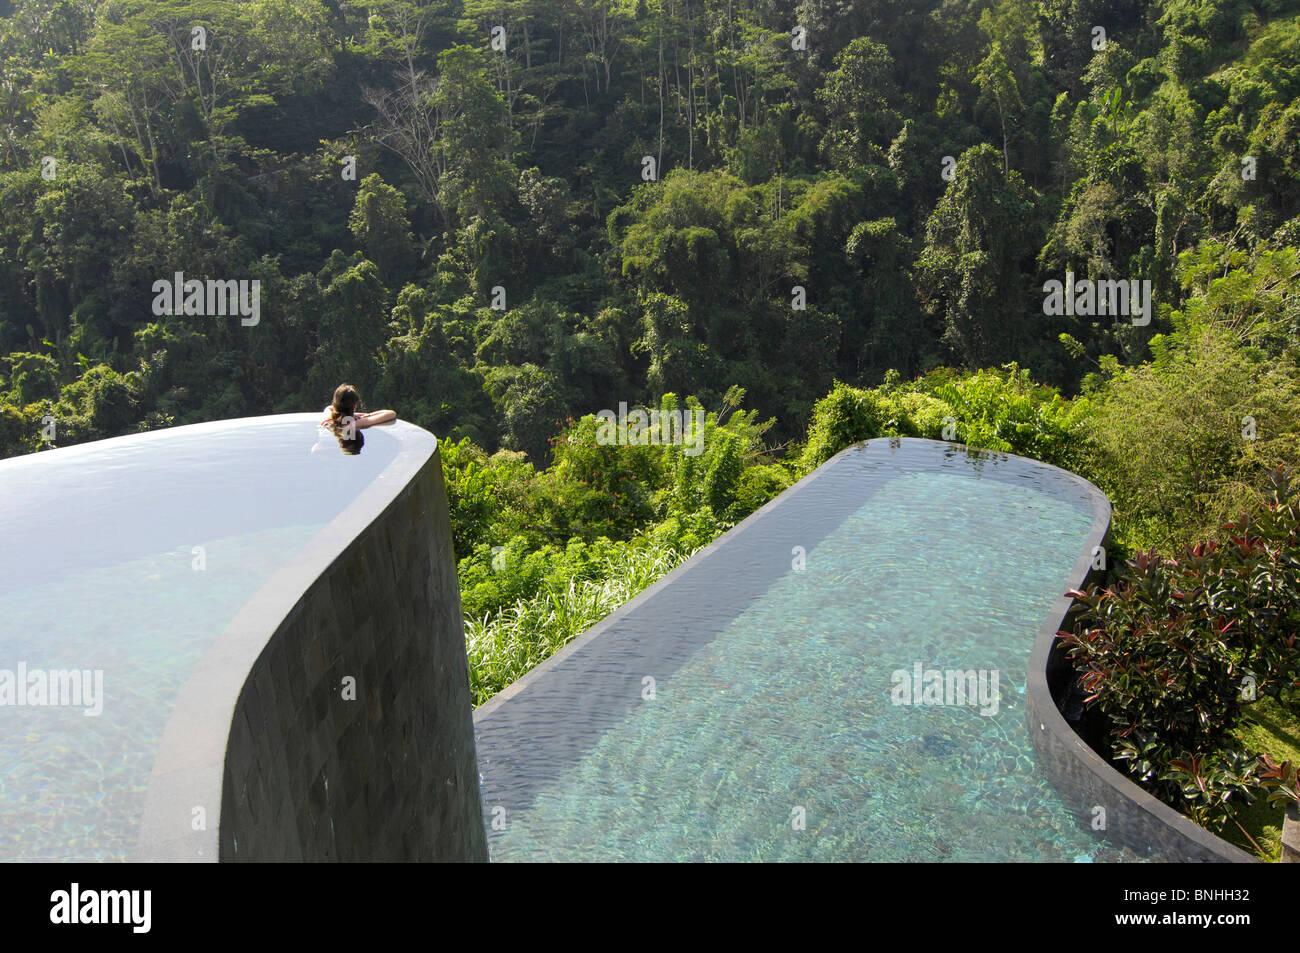 Bali Asia Indonesia Travel Location Ubud Hotel Ubud Hanging Gardens Pool  One Person Swimming Modern Architecture Bathing